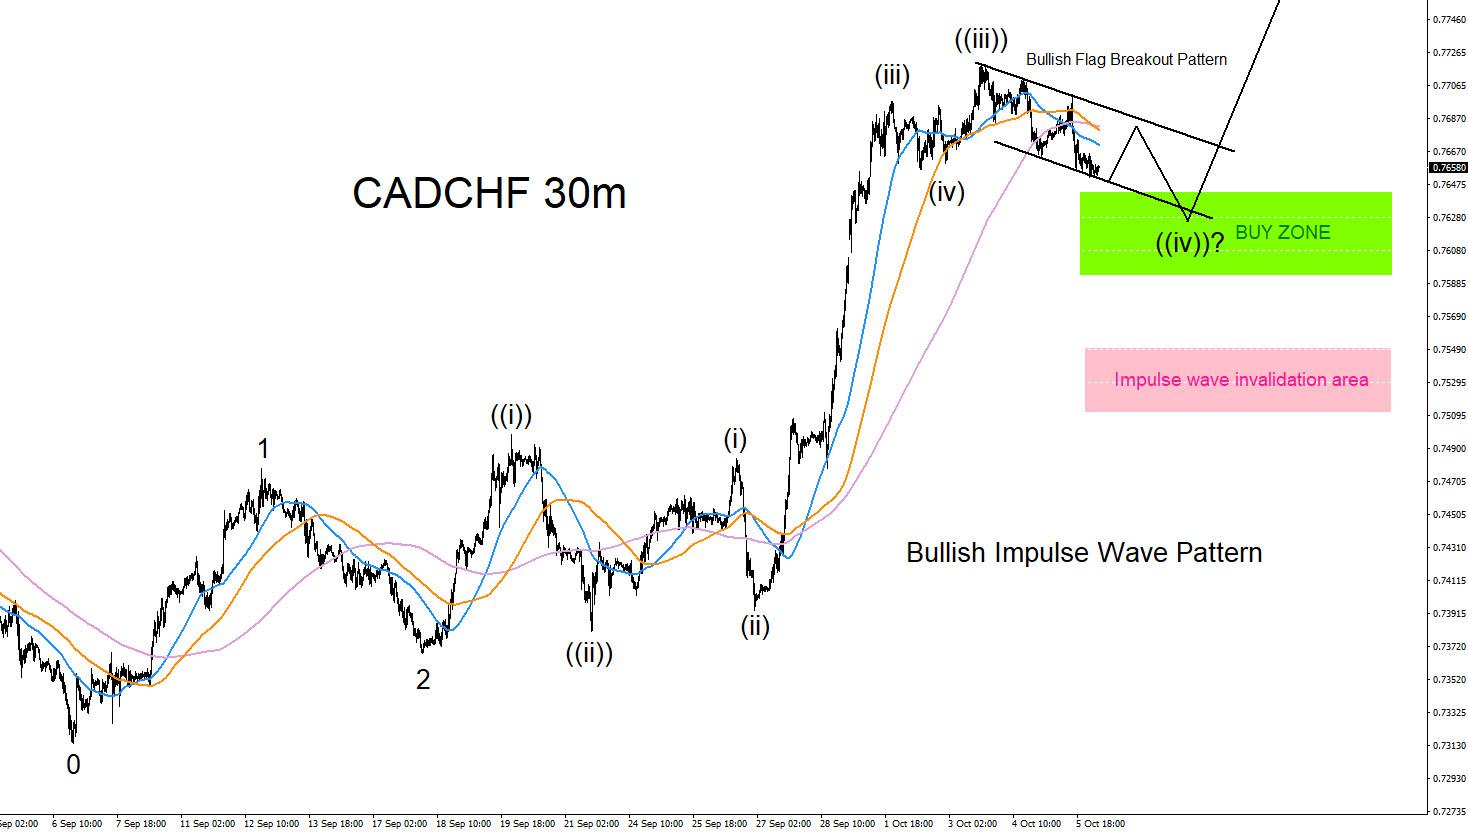 CADCHF, Elliottwave, elliott wave, Patterns, technical analysis, forex, trading, bullish